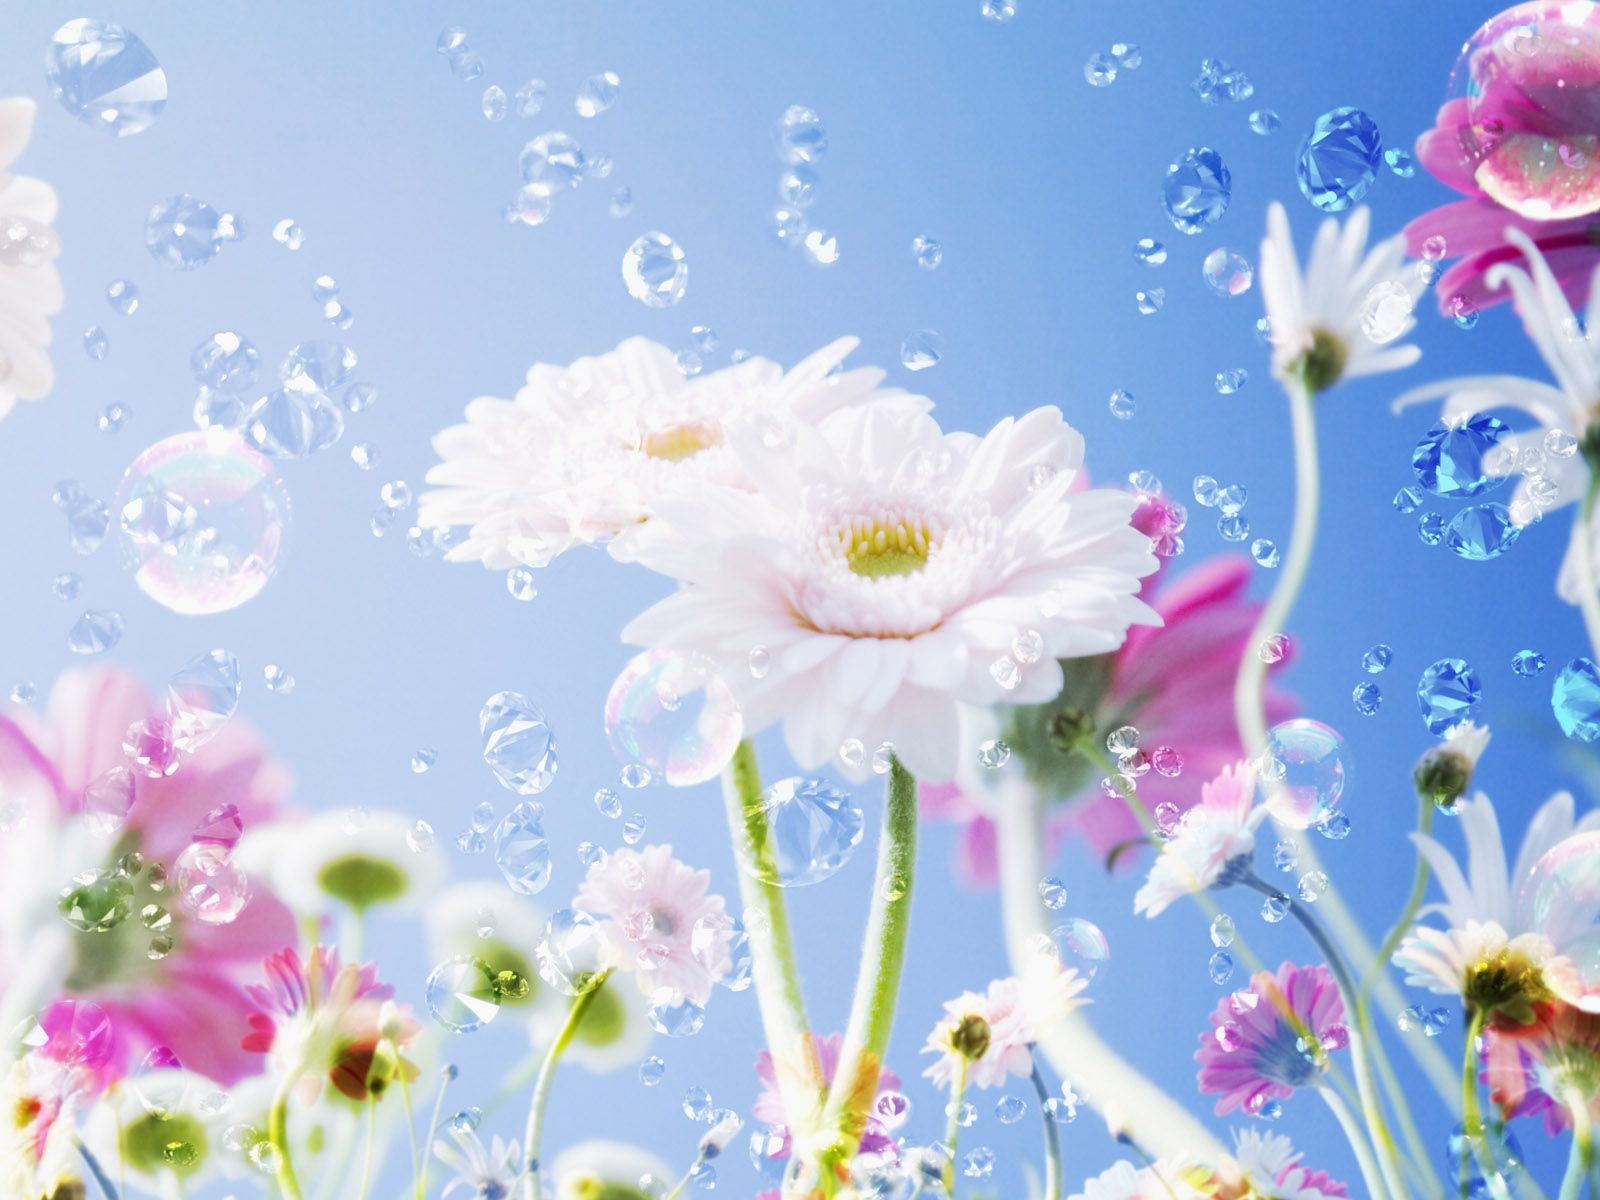 Pretty Flower Wallpaper Picture Yln Beautiful Flowers Hd Wallpapers Flower Wallpaper Rose Flower Wallpaper